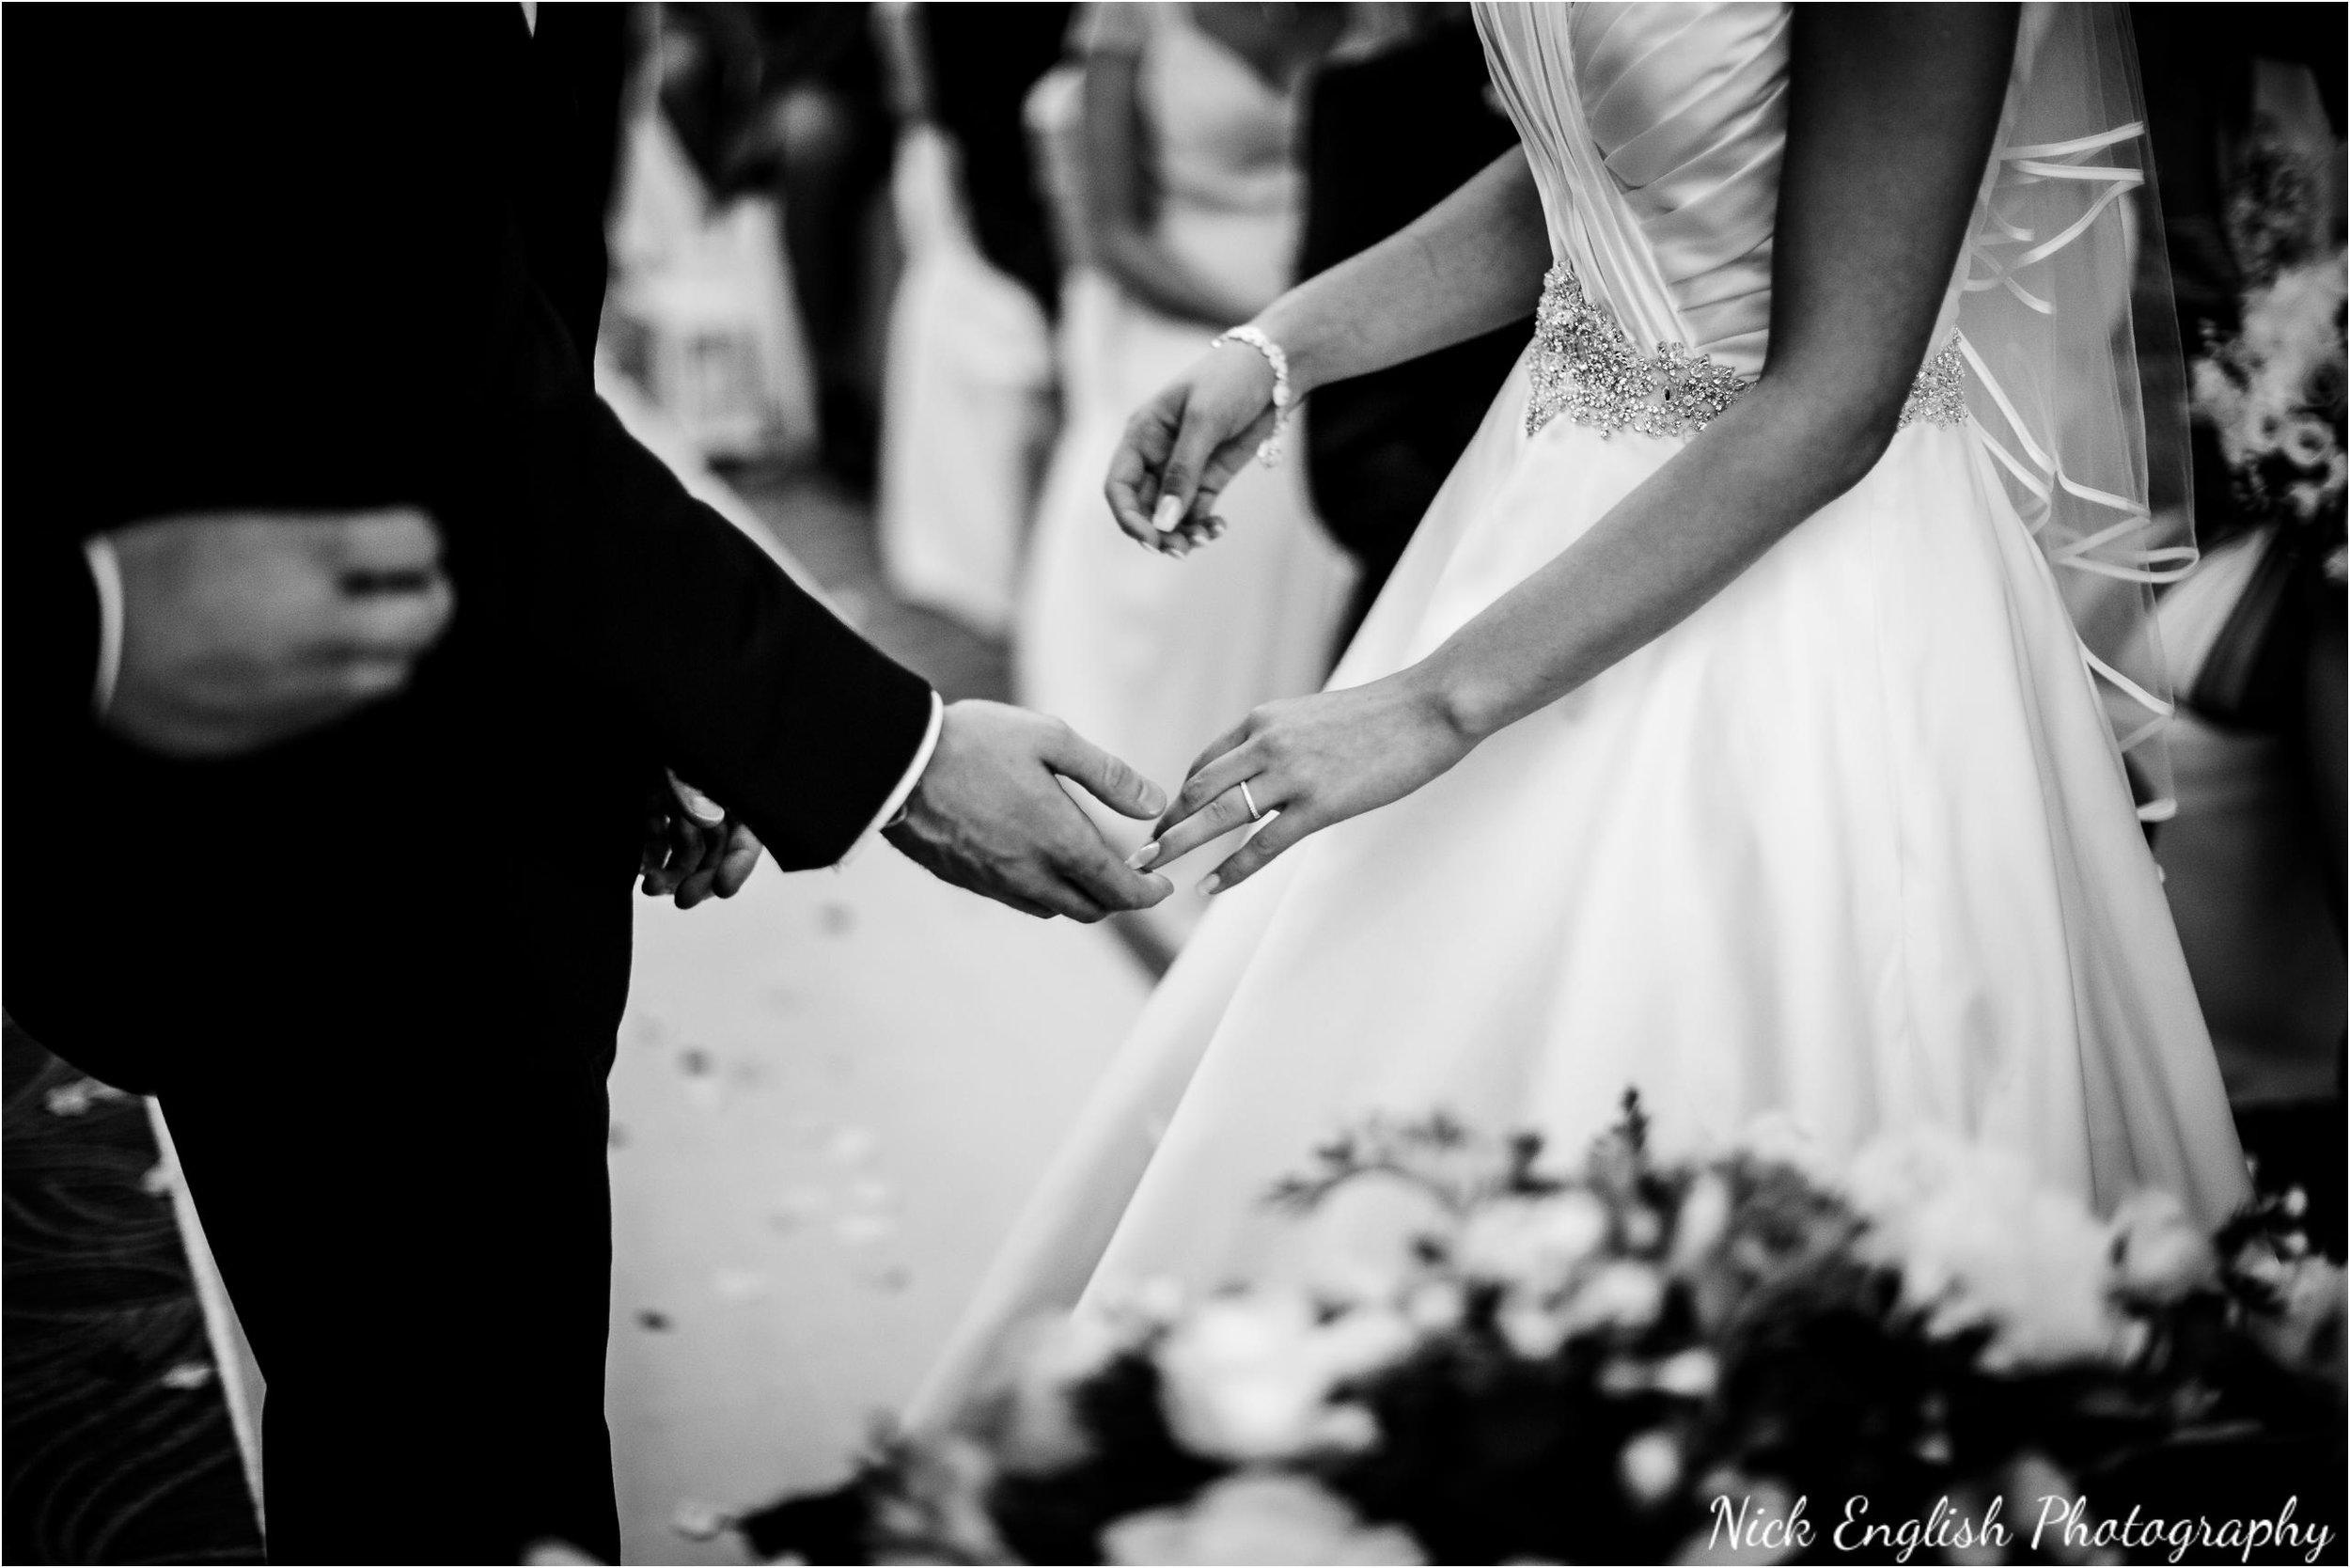 Emily David Wedding Photographs at Barton Grange Preston by Nick English Photography 73jpg.jpeg